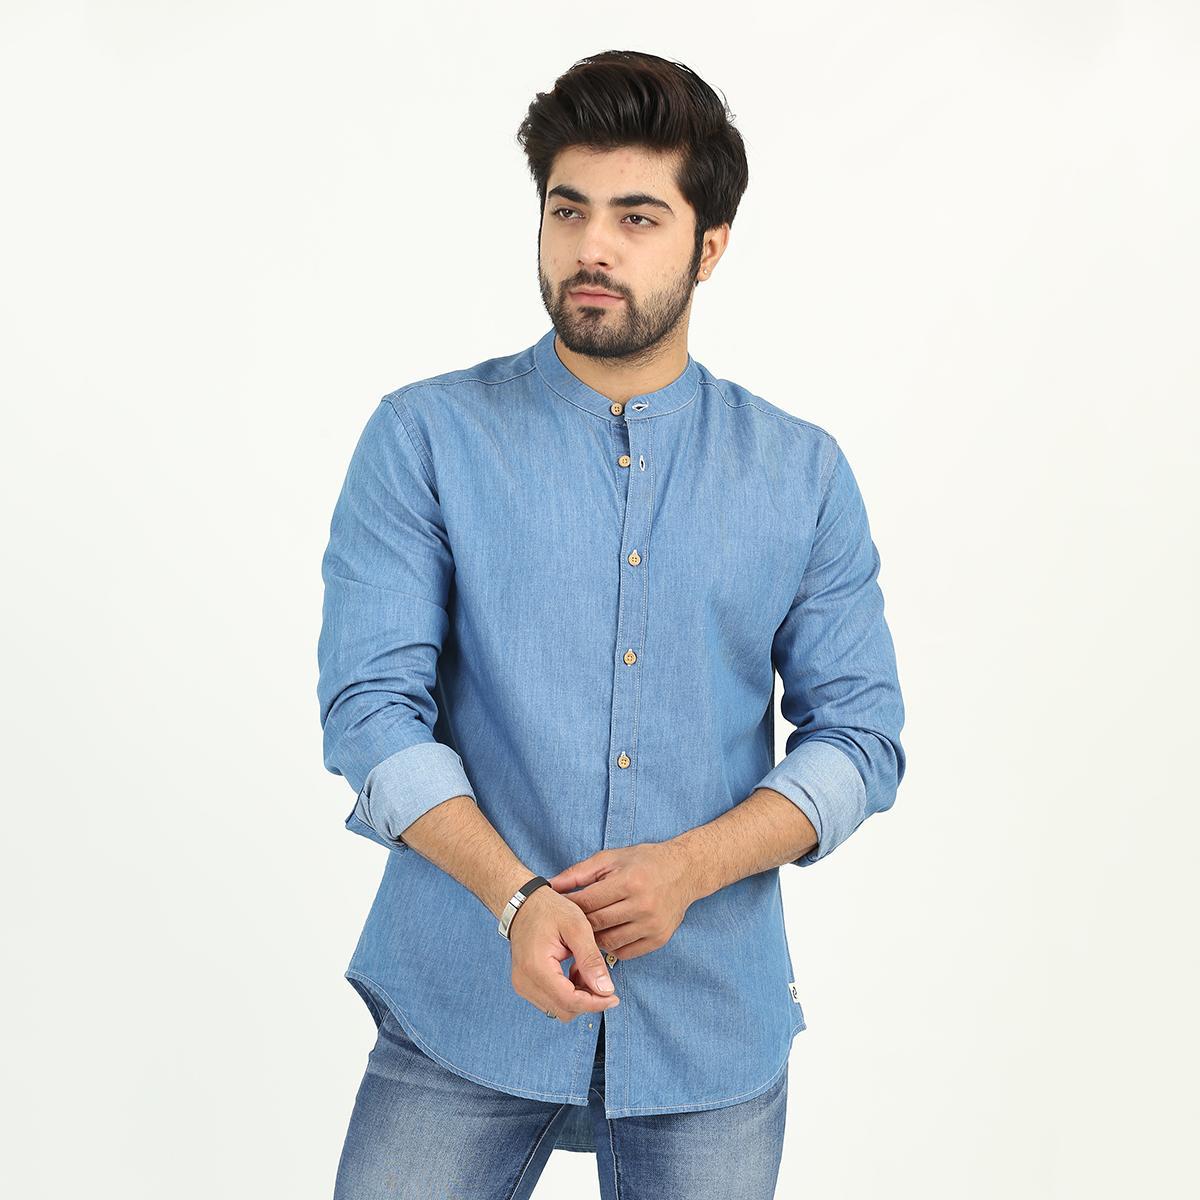 Denizen Banded Collar Shirt Stonewash Shirts Men 34652-0001